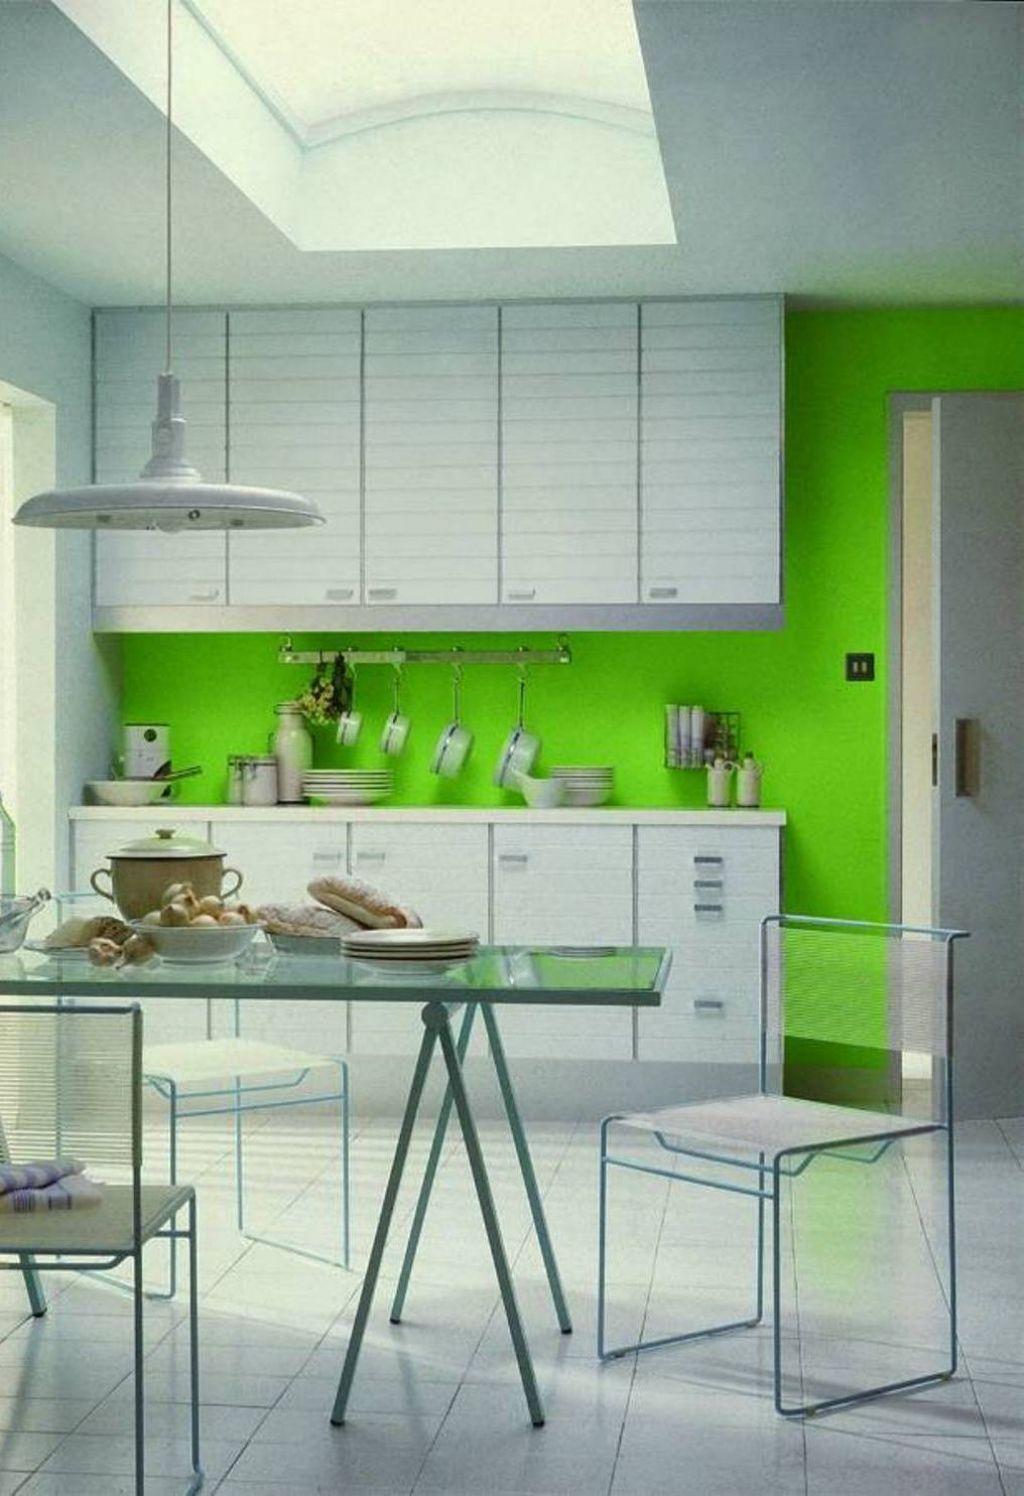 Stylish And Modern Kitchen Color Schemes Simple Kitchen Design Interior Design Kitchen Green Kitchen Designs